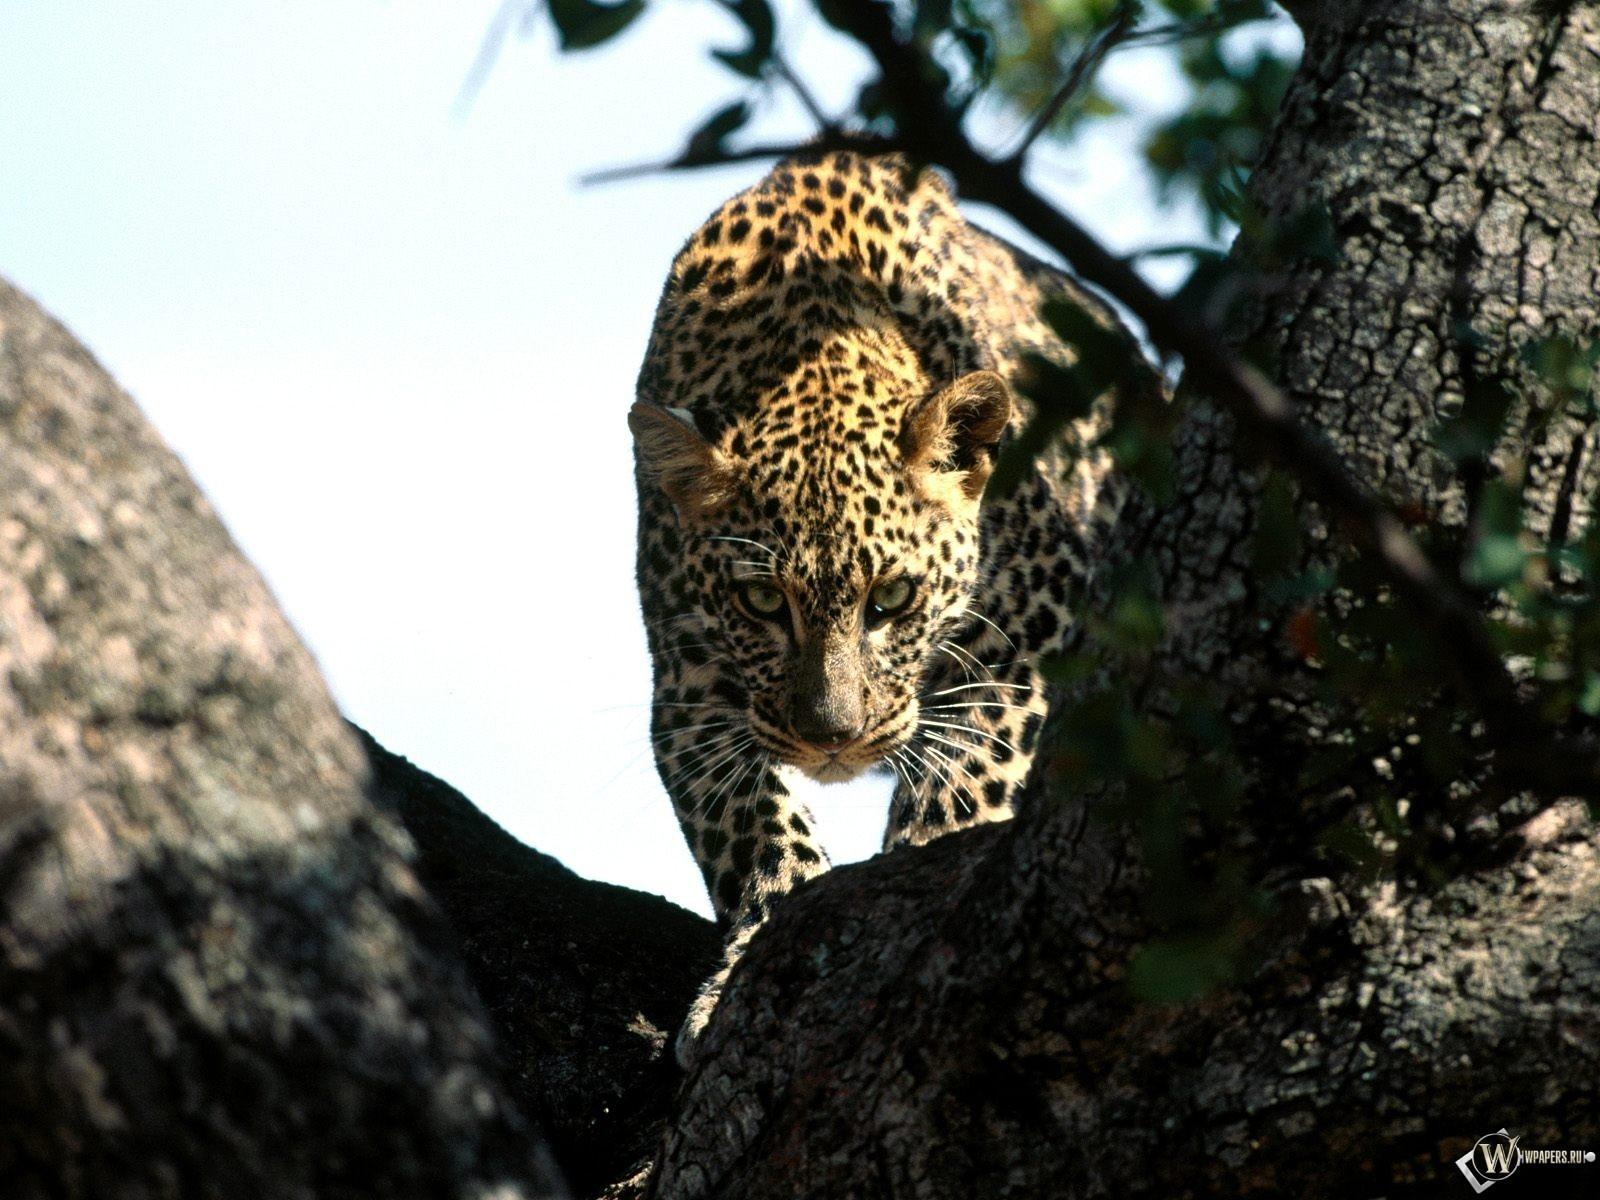 Леопард крадется по дереву 1600x1200